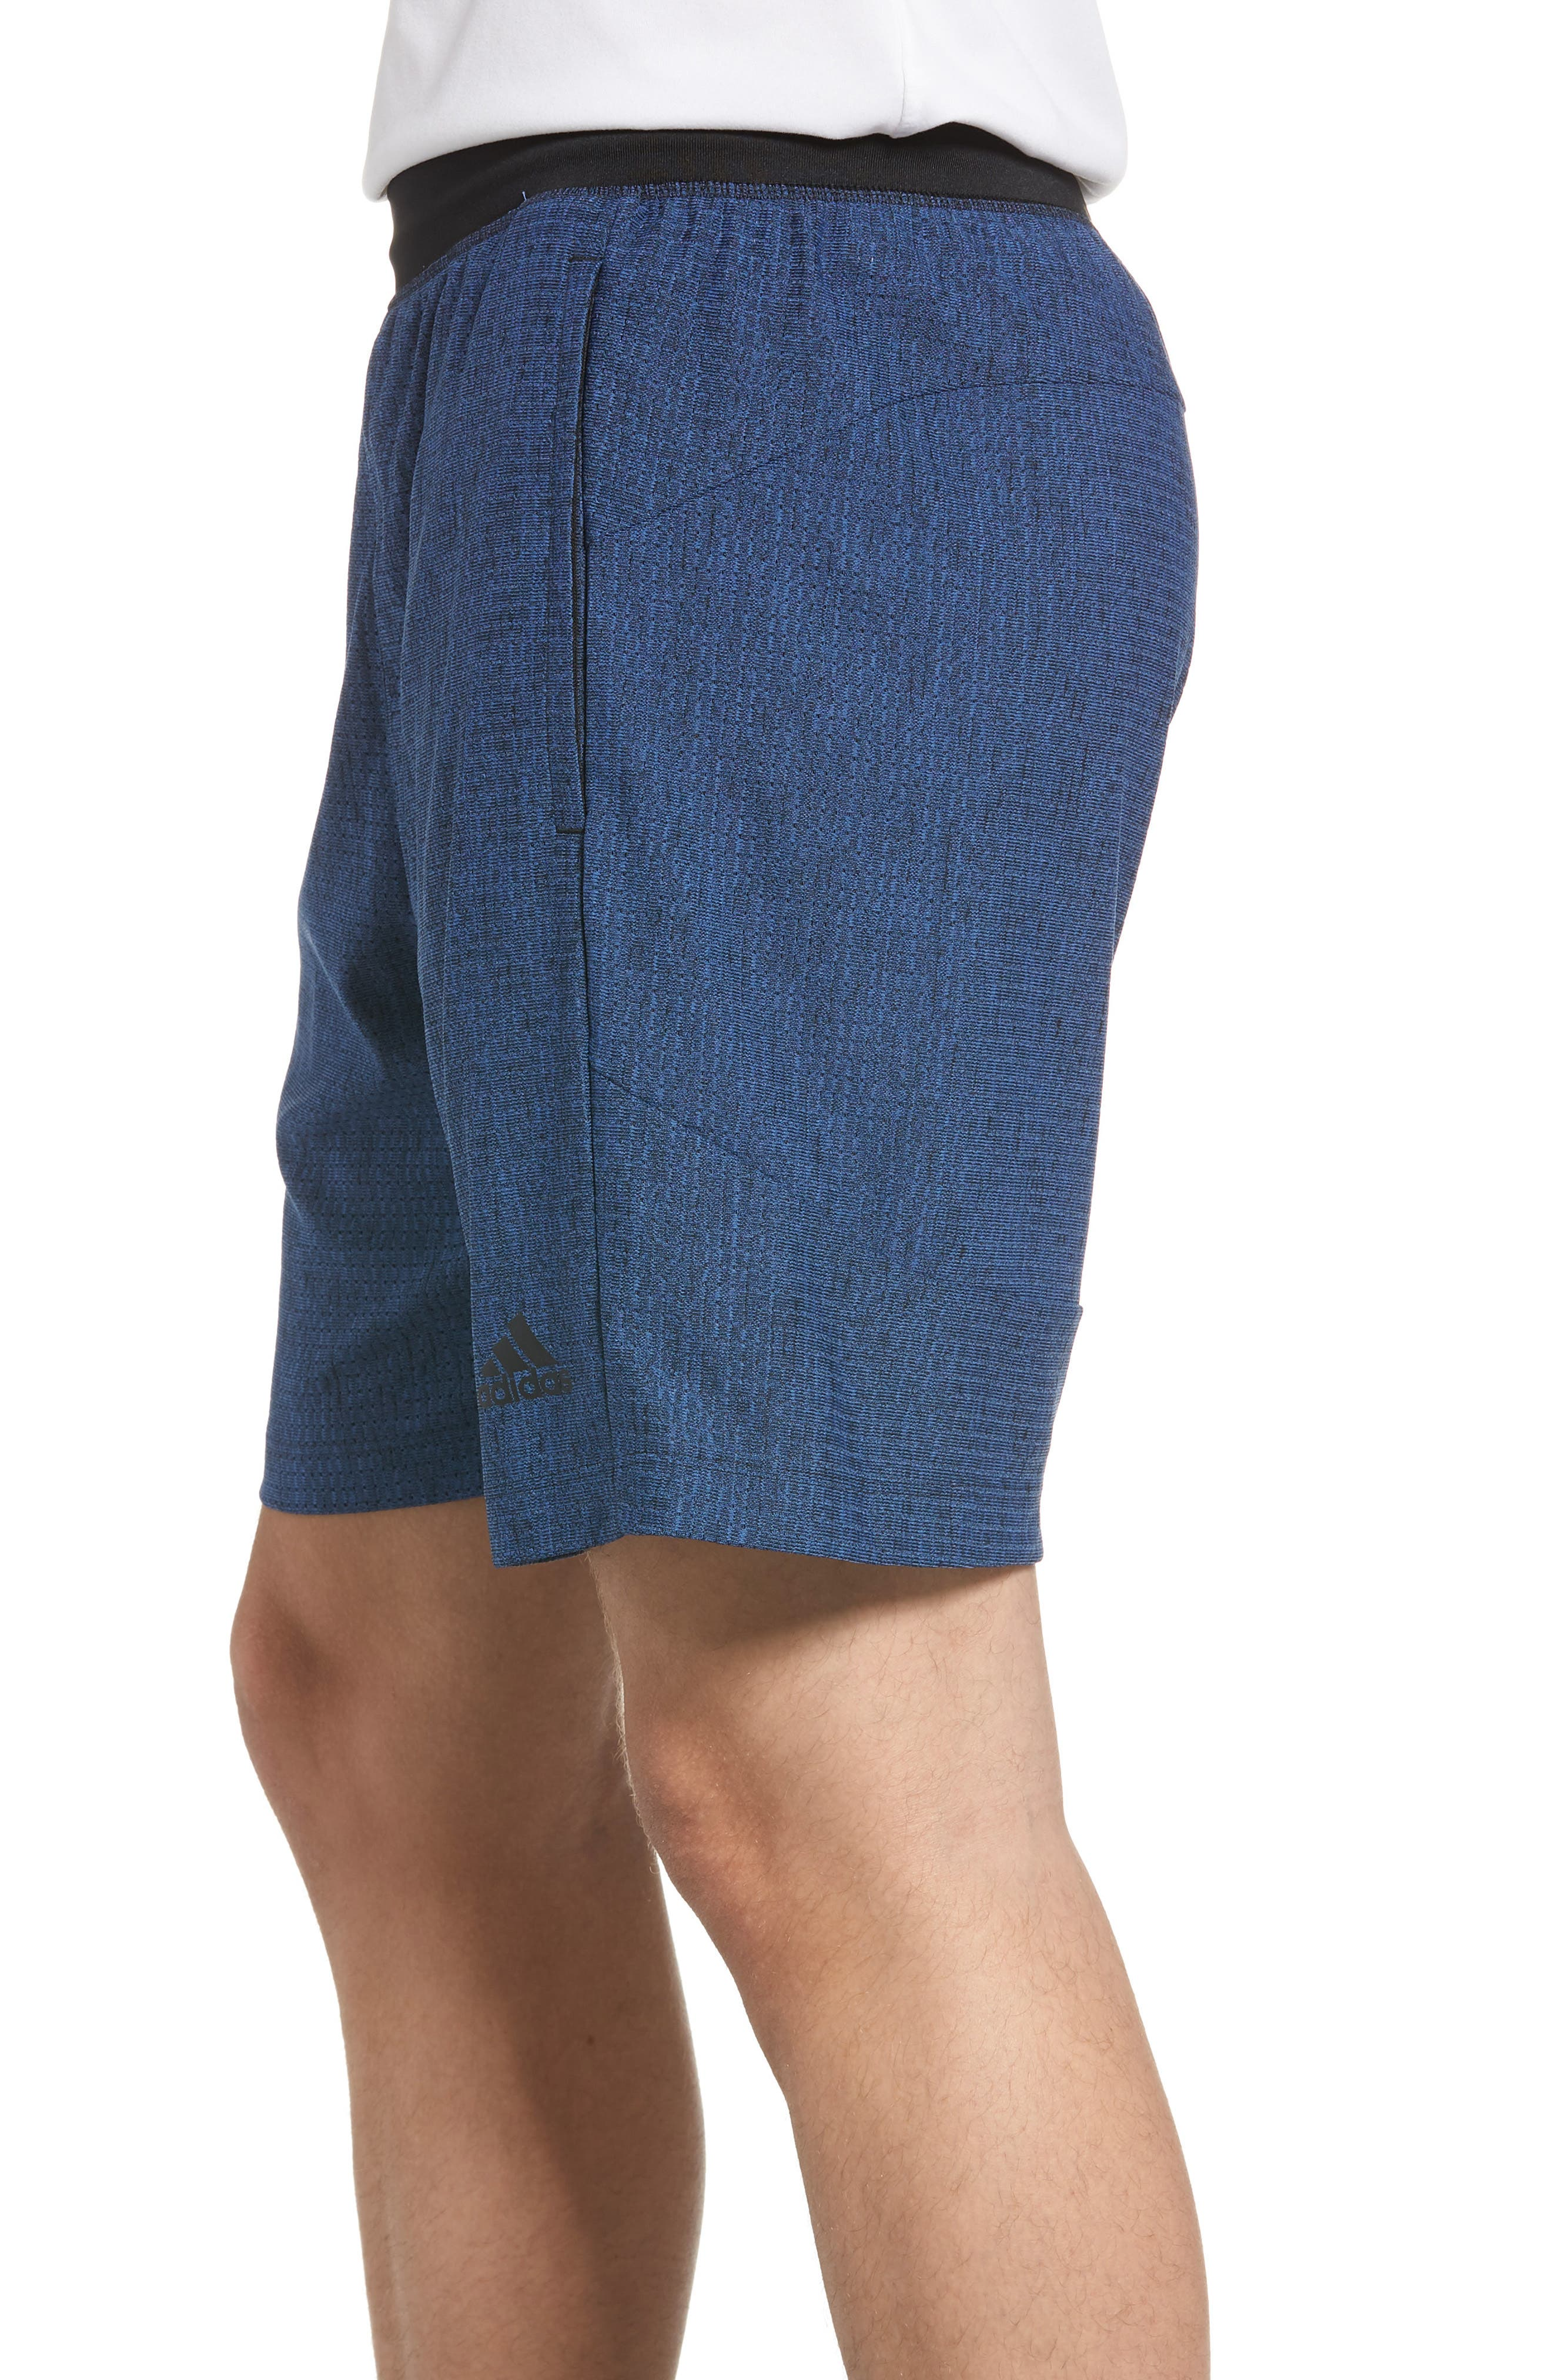 Speedbreaker Shorts,                             Alternate thumbnail 3, color,                             Hi-Res Blue